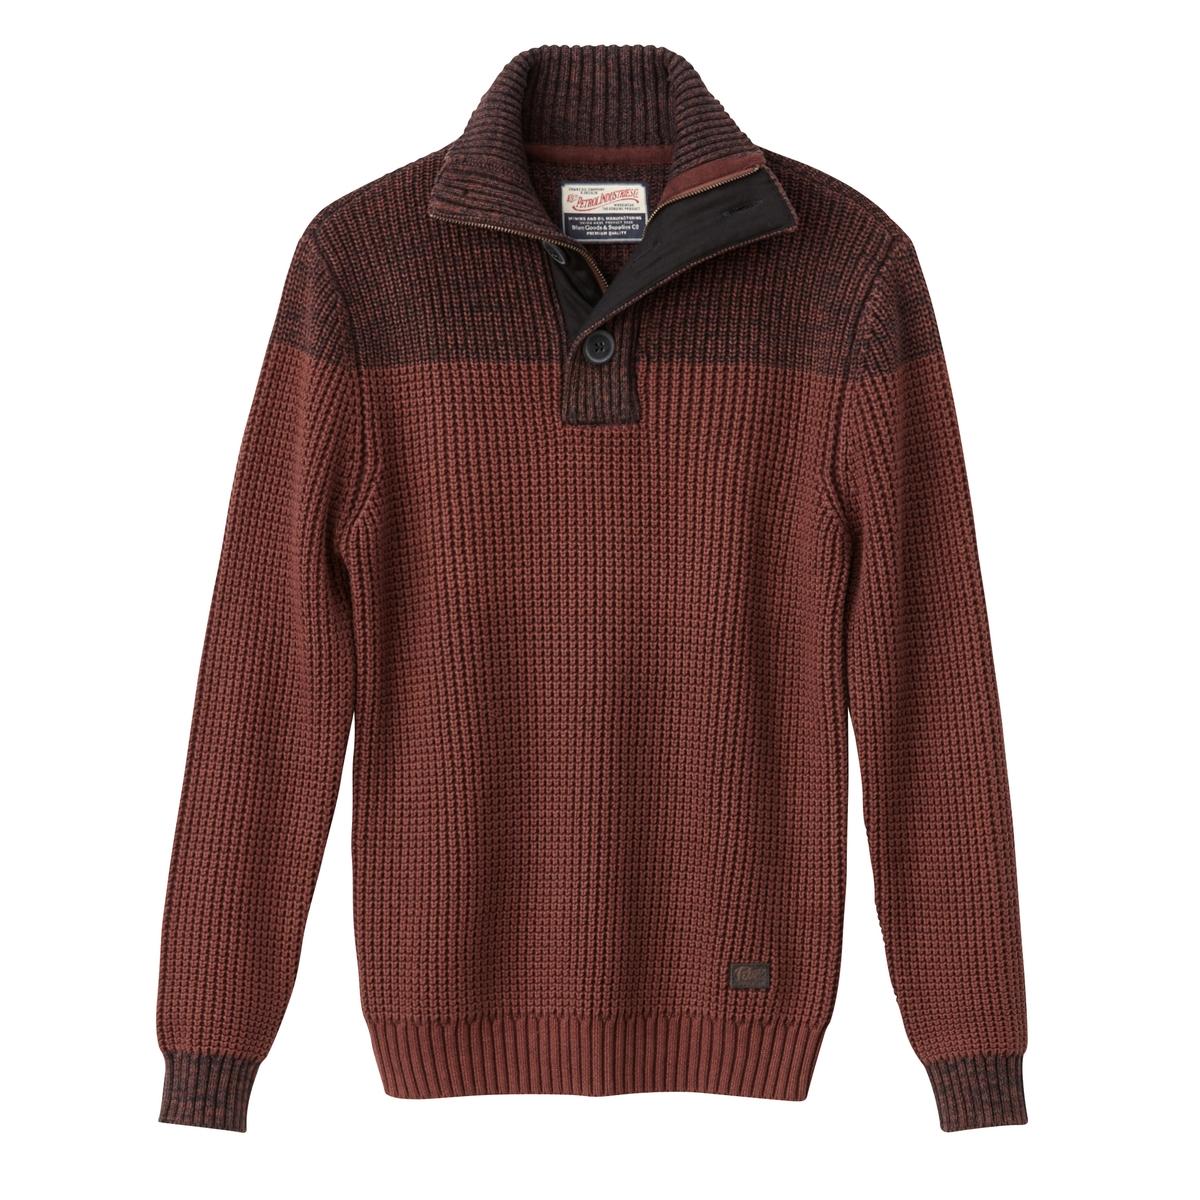 Пуловер крупной вязки от PETROL INDUSTRIES